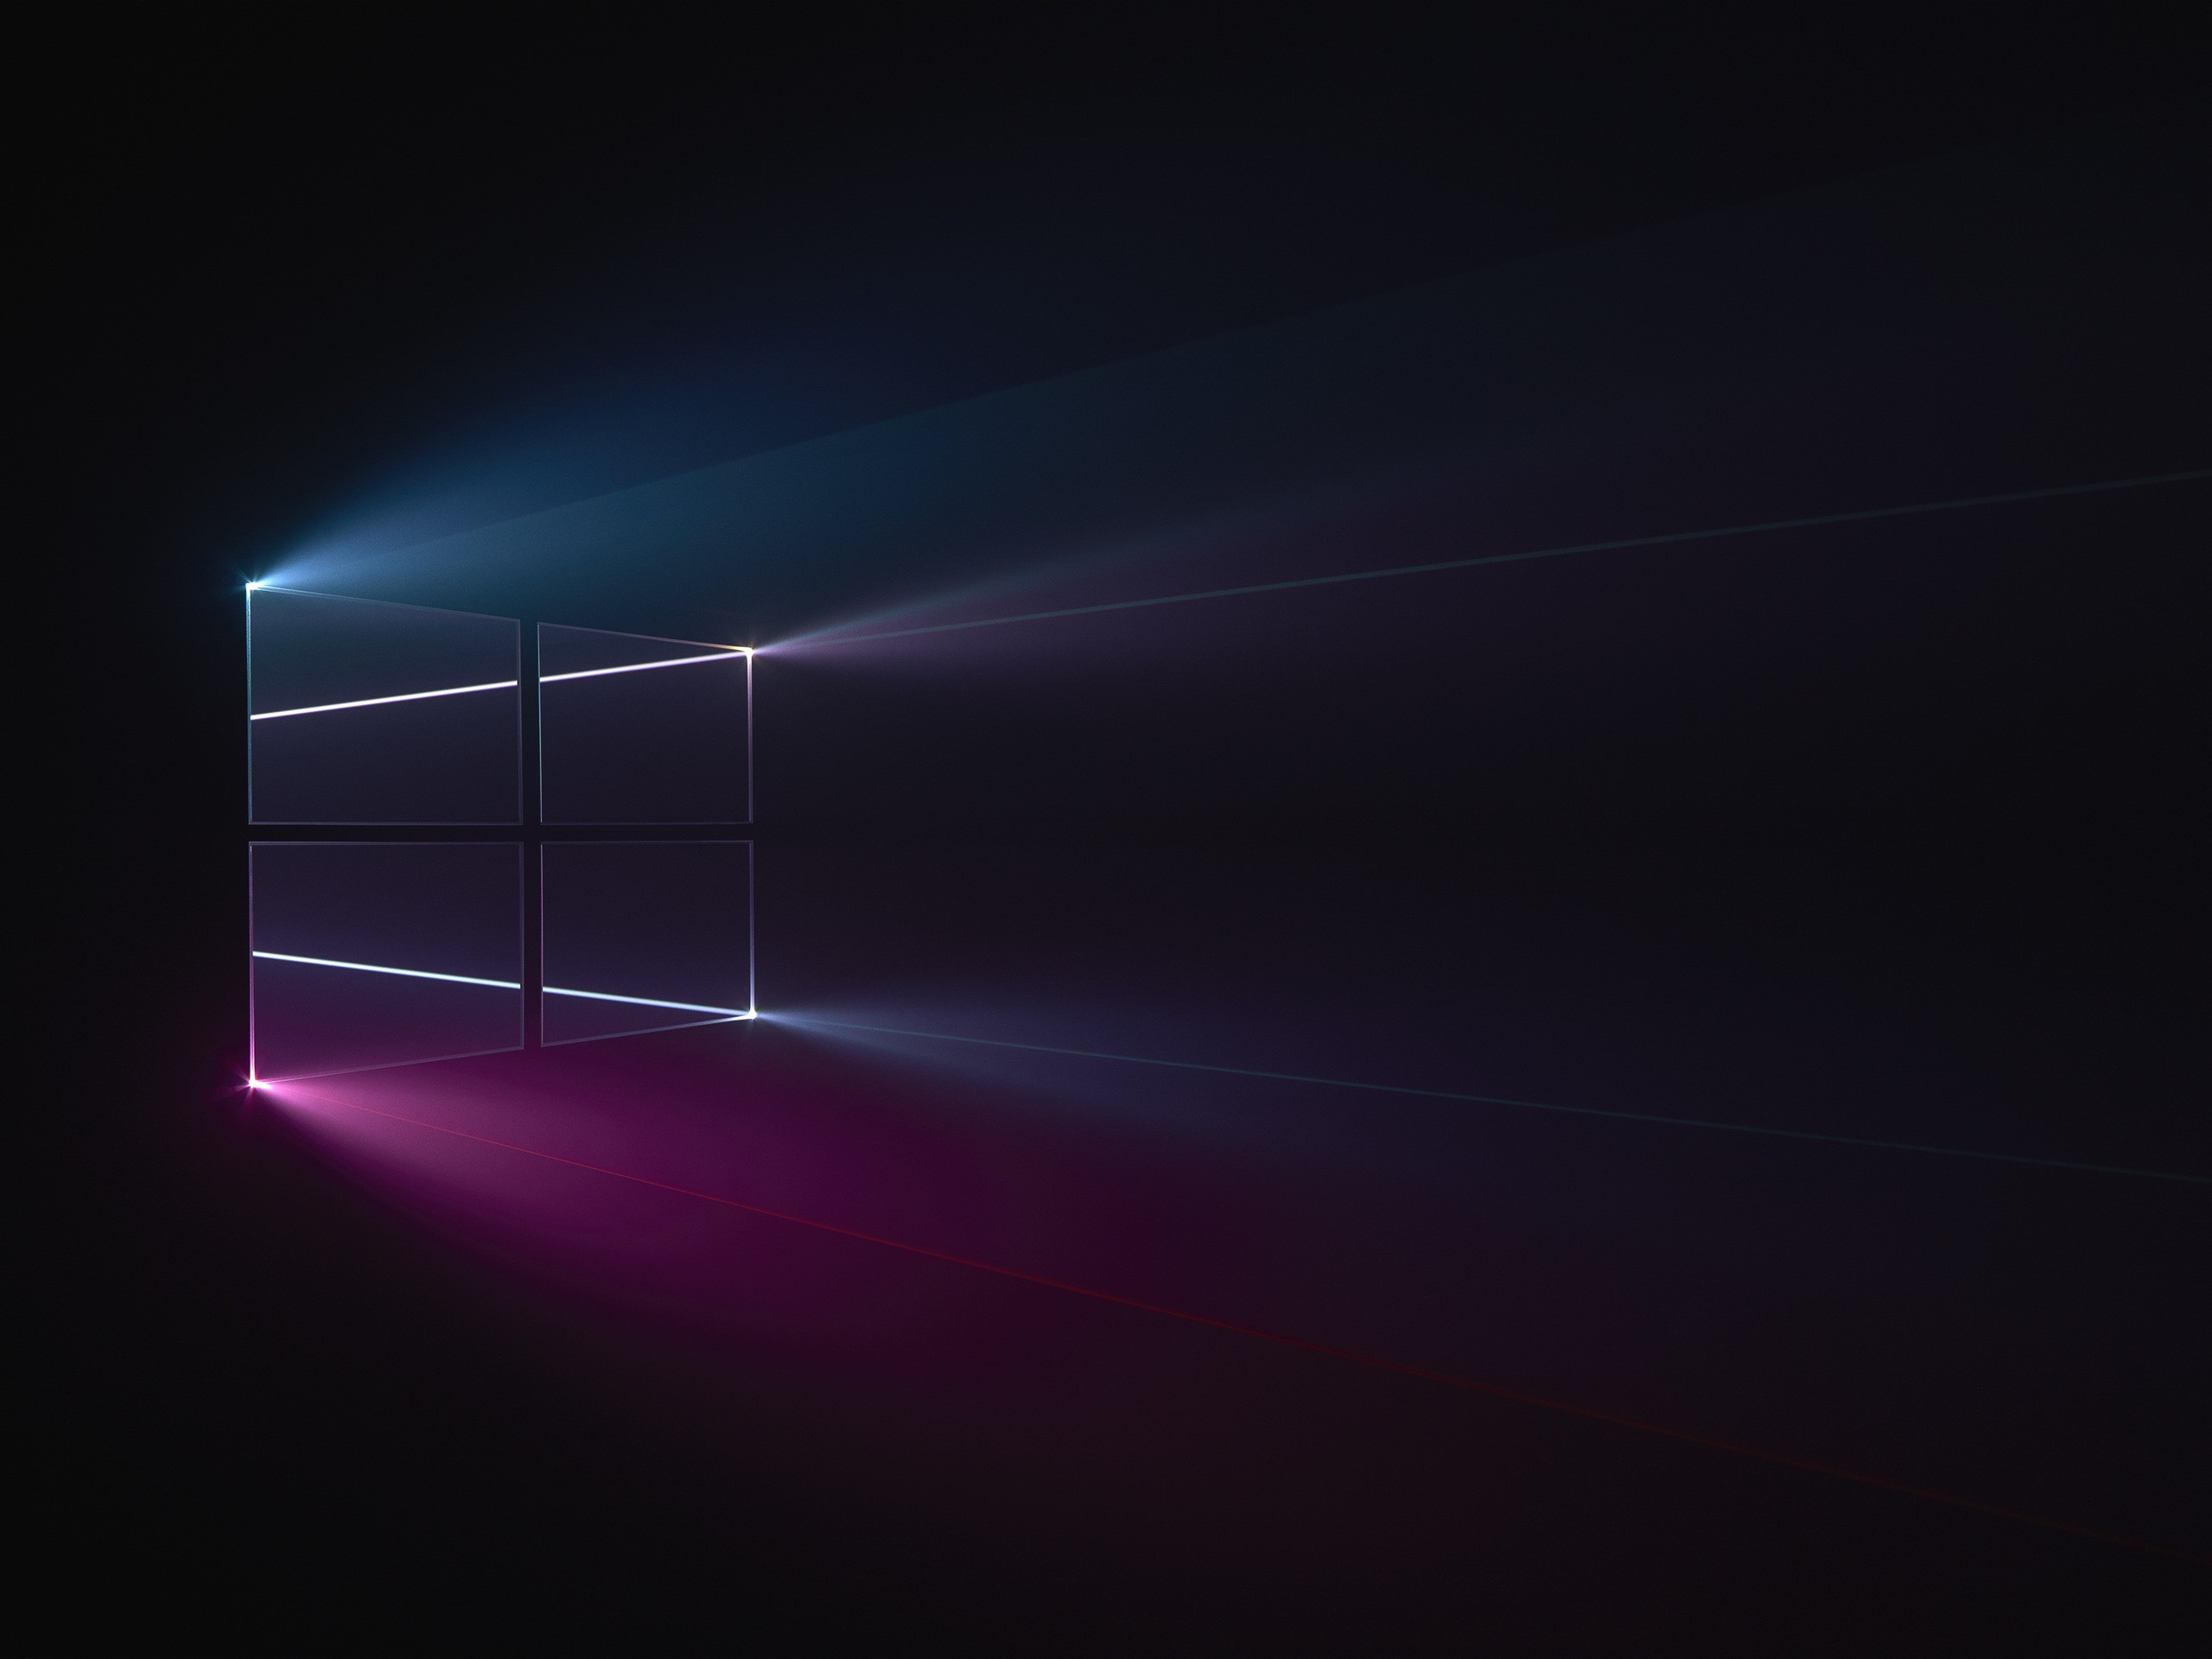 Wallpaper for windows 10 desktop 80 images - Windows wallpaper themes free ...